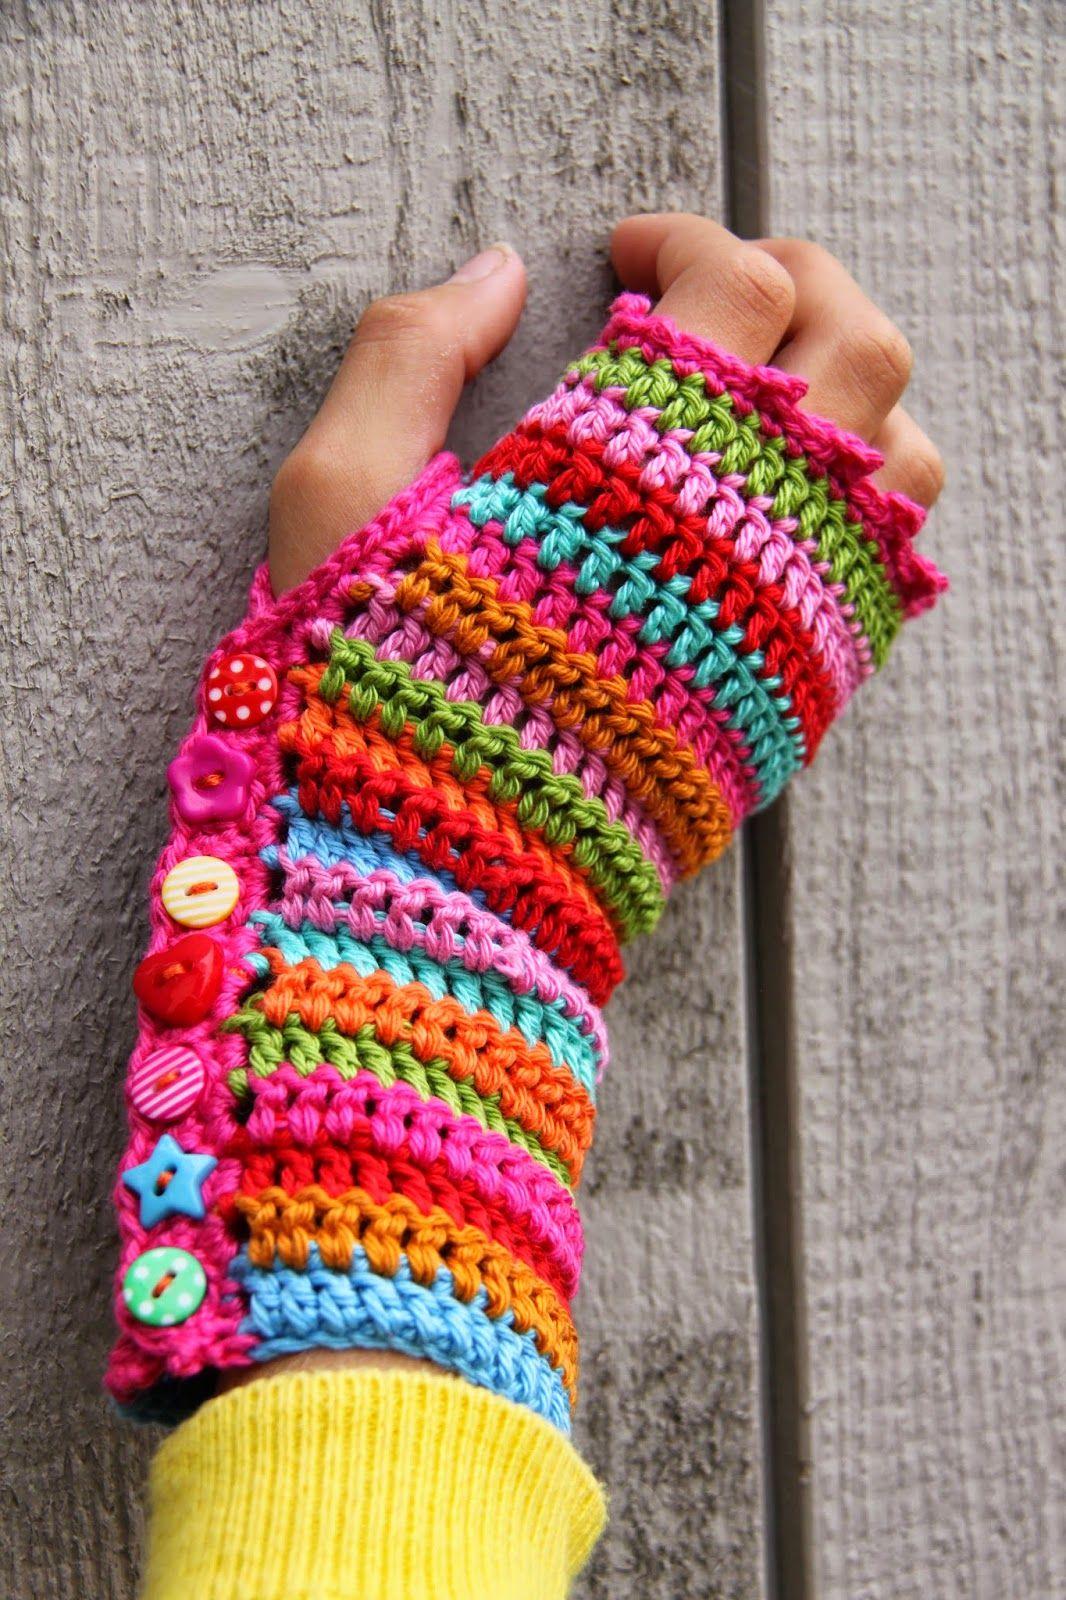 Ak at home   Crochet Ideas   Pinterest   Mitones, Guantes y Tejido